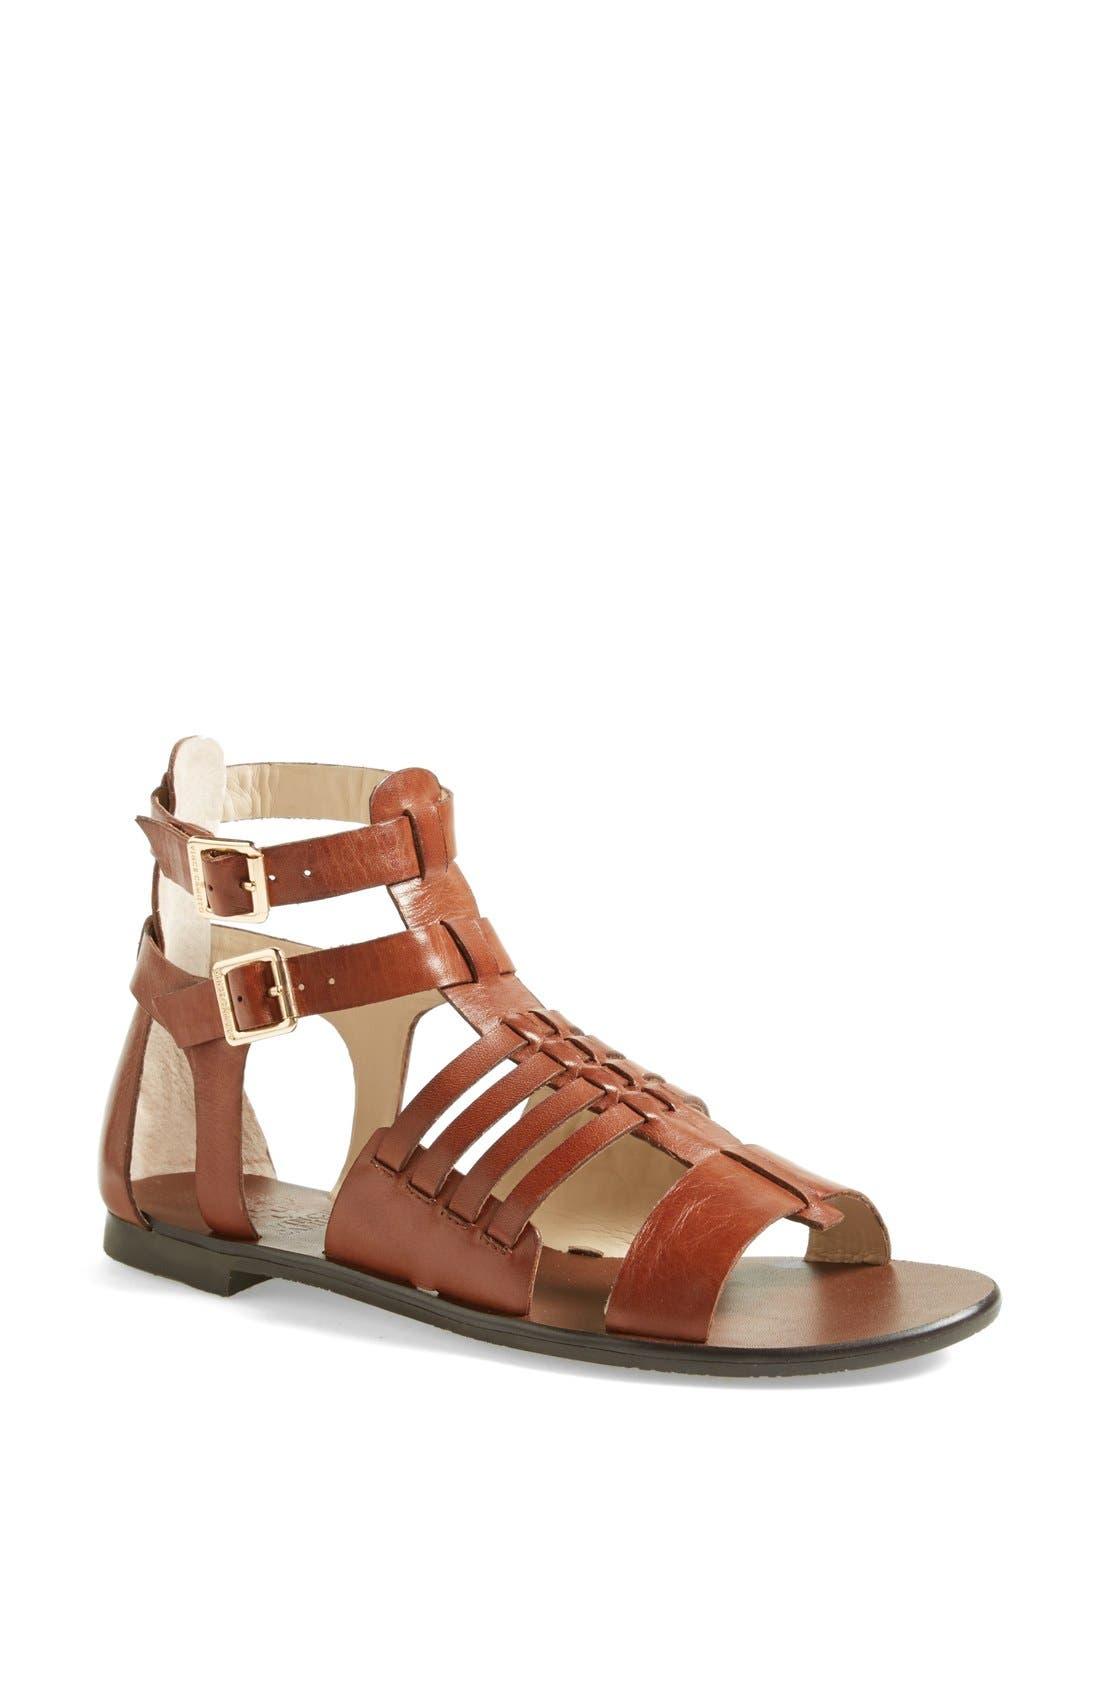 Alternate Image 1 Selected - Vince Camuto 'Jenorra' Sandal